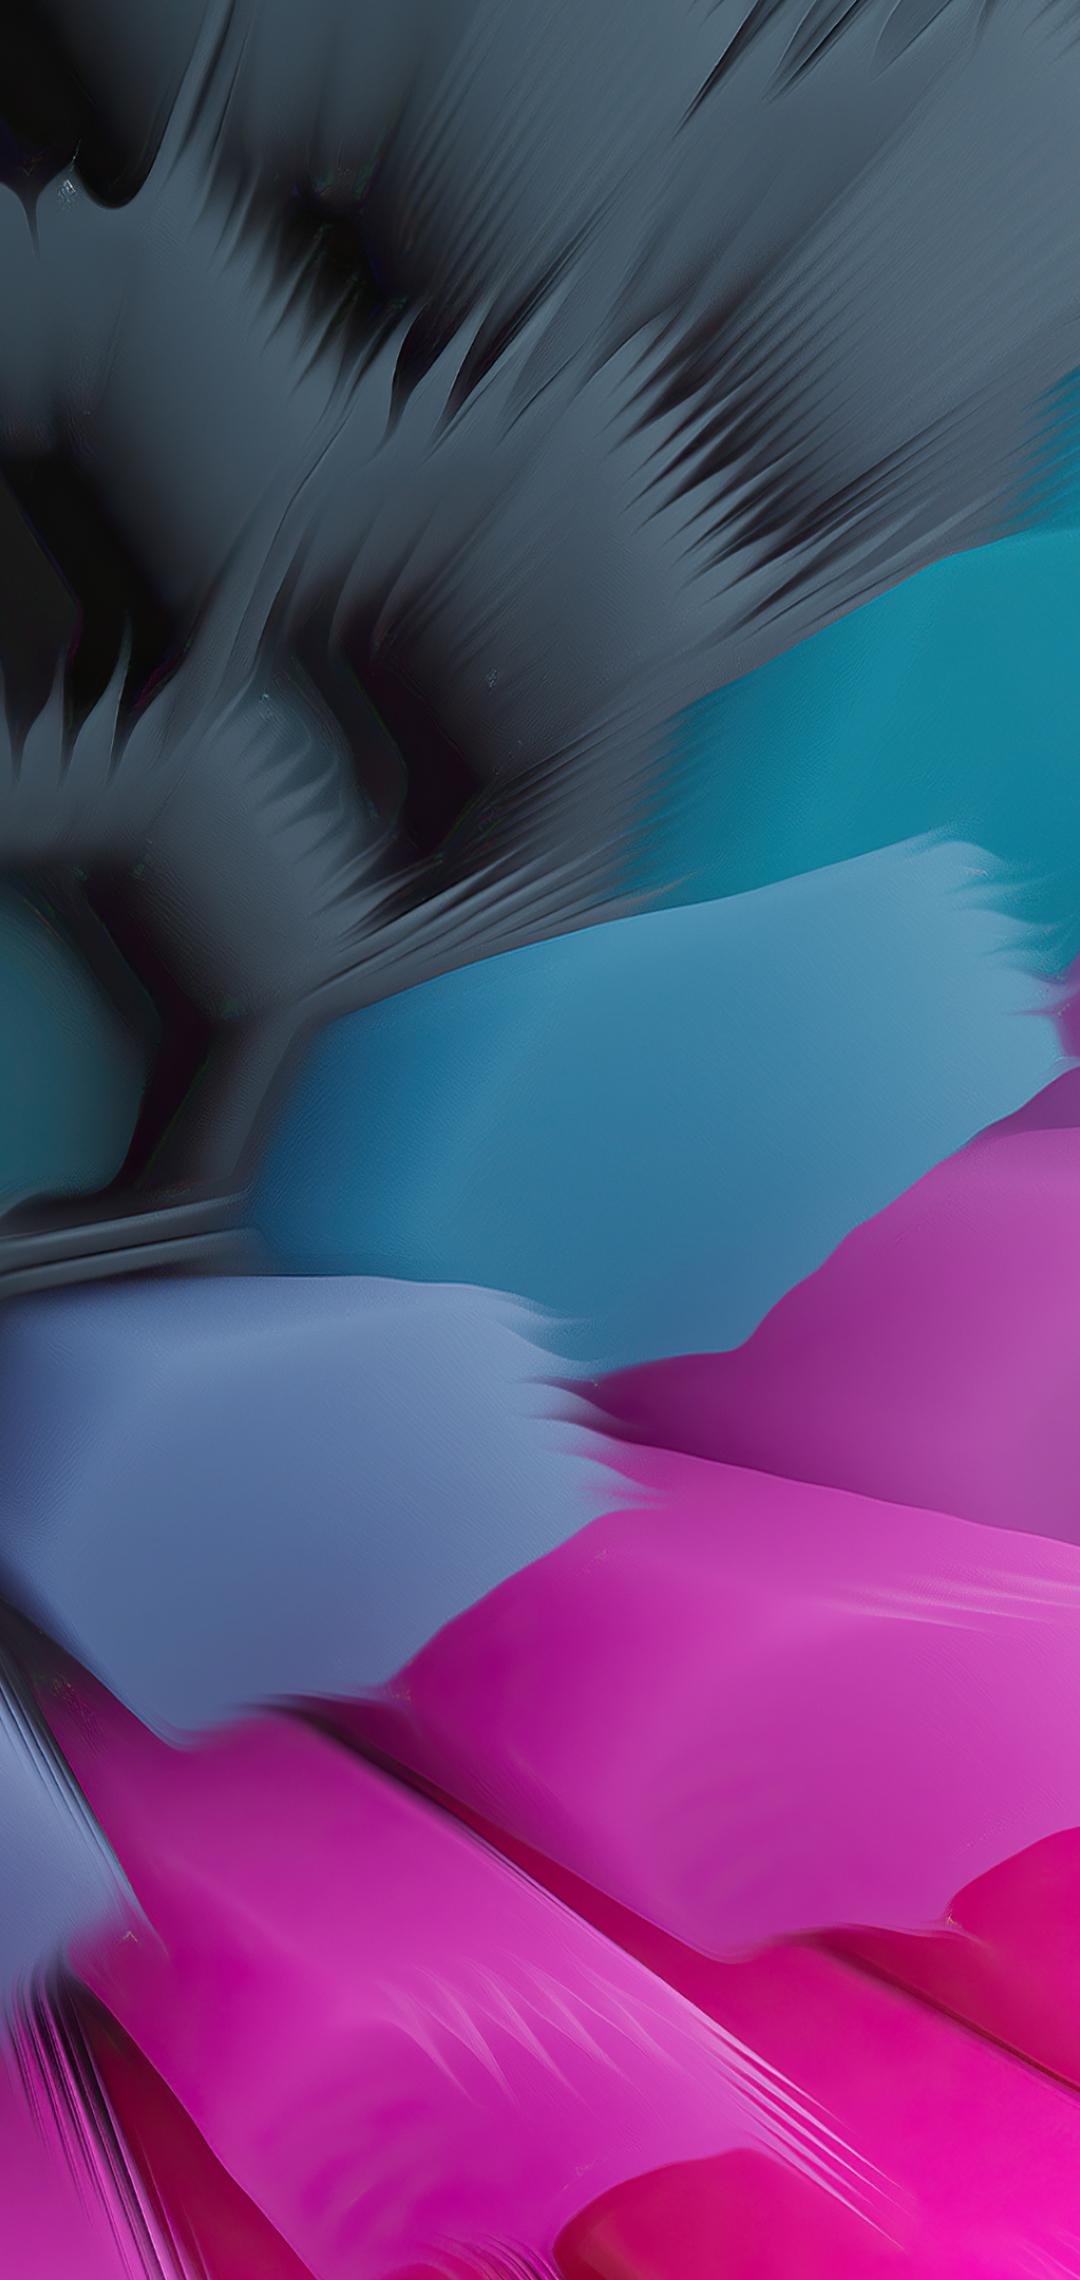 Pink Blue 4K Hexagon Wallpaper in 1080x2280 Resolution